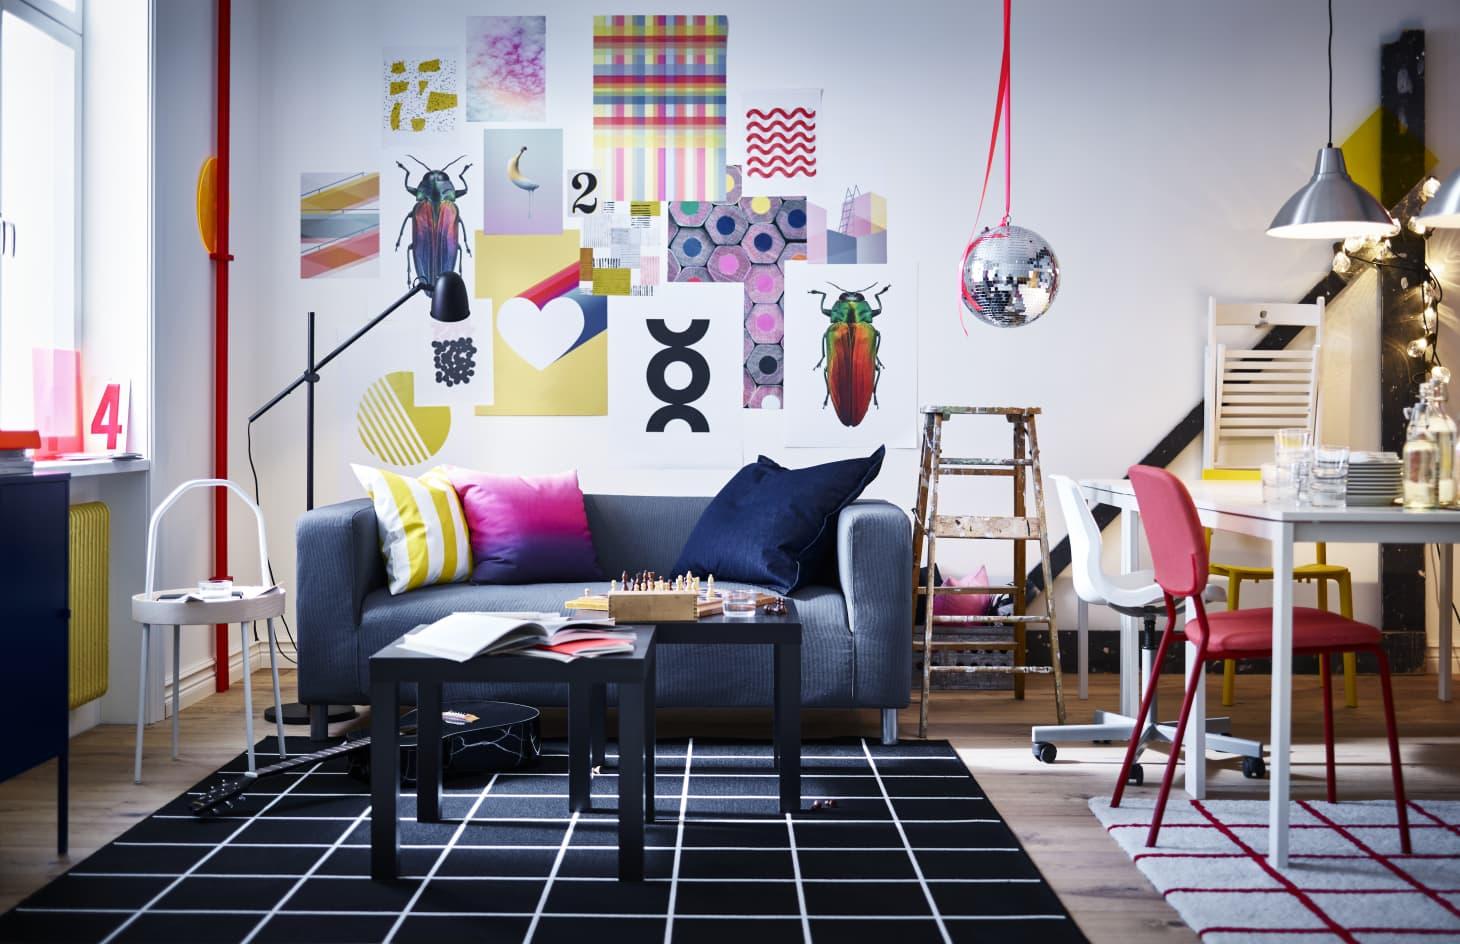 2020 Ikea Catalog - Design Trends | Kitchn